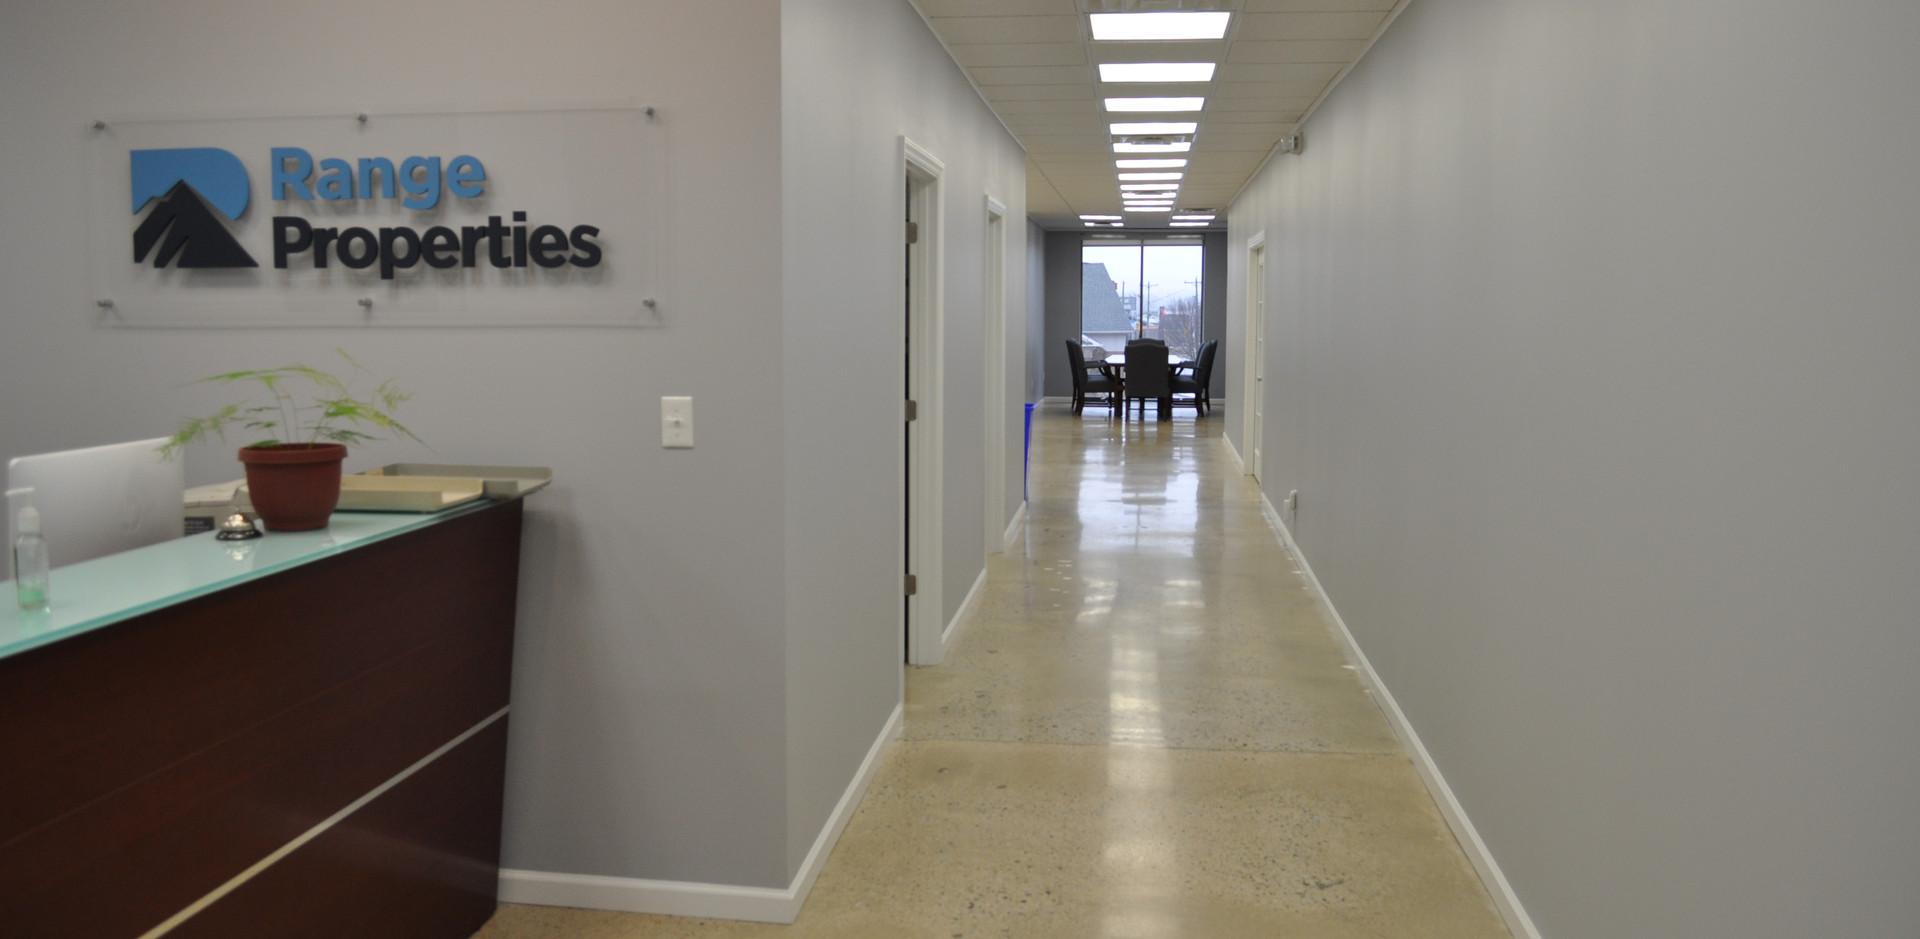 Range Properties Office Polished